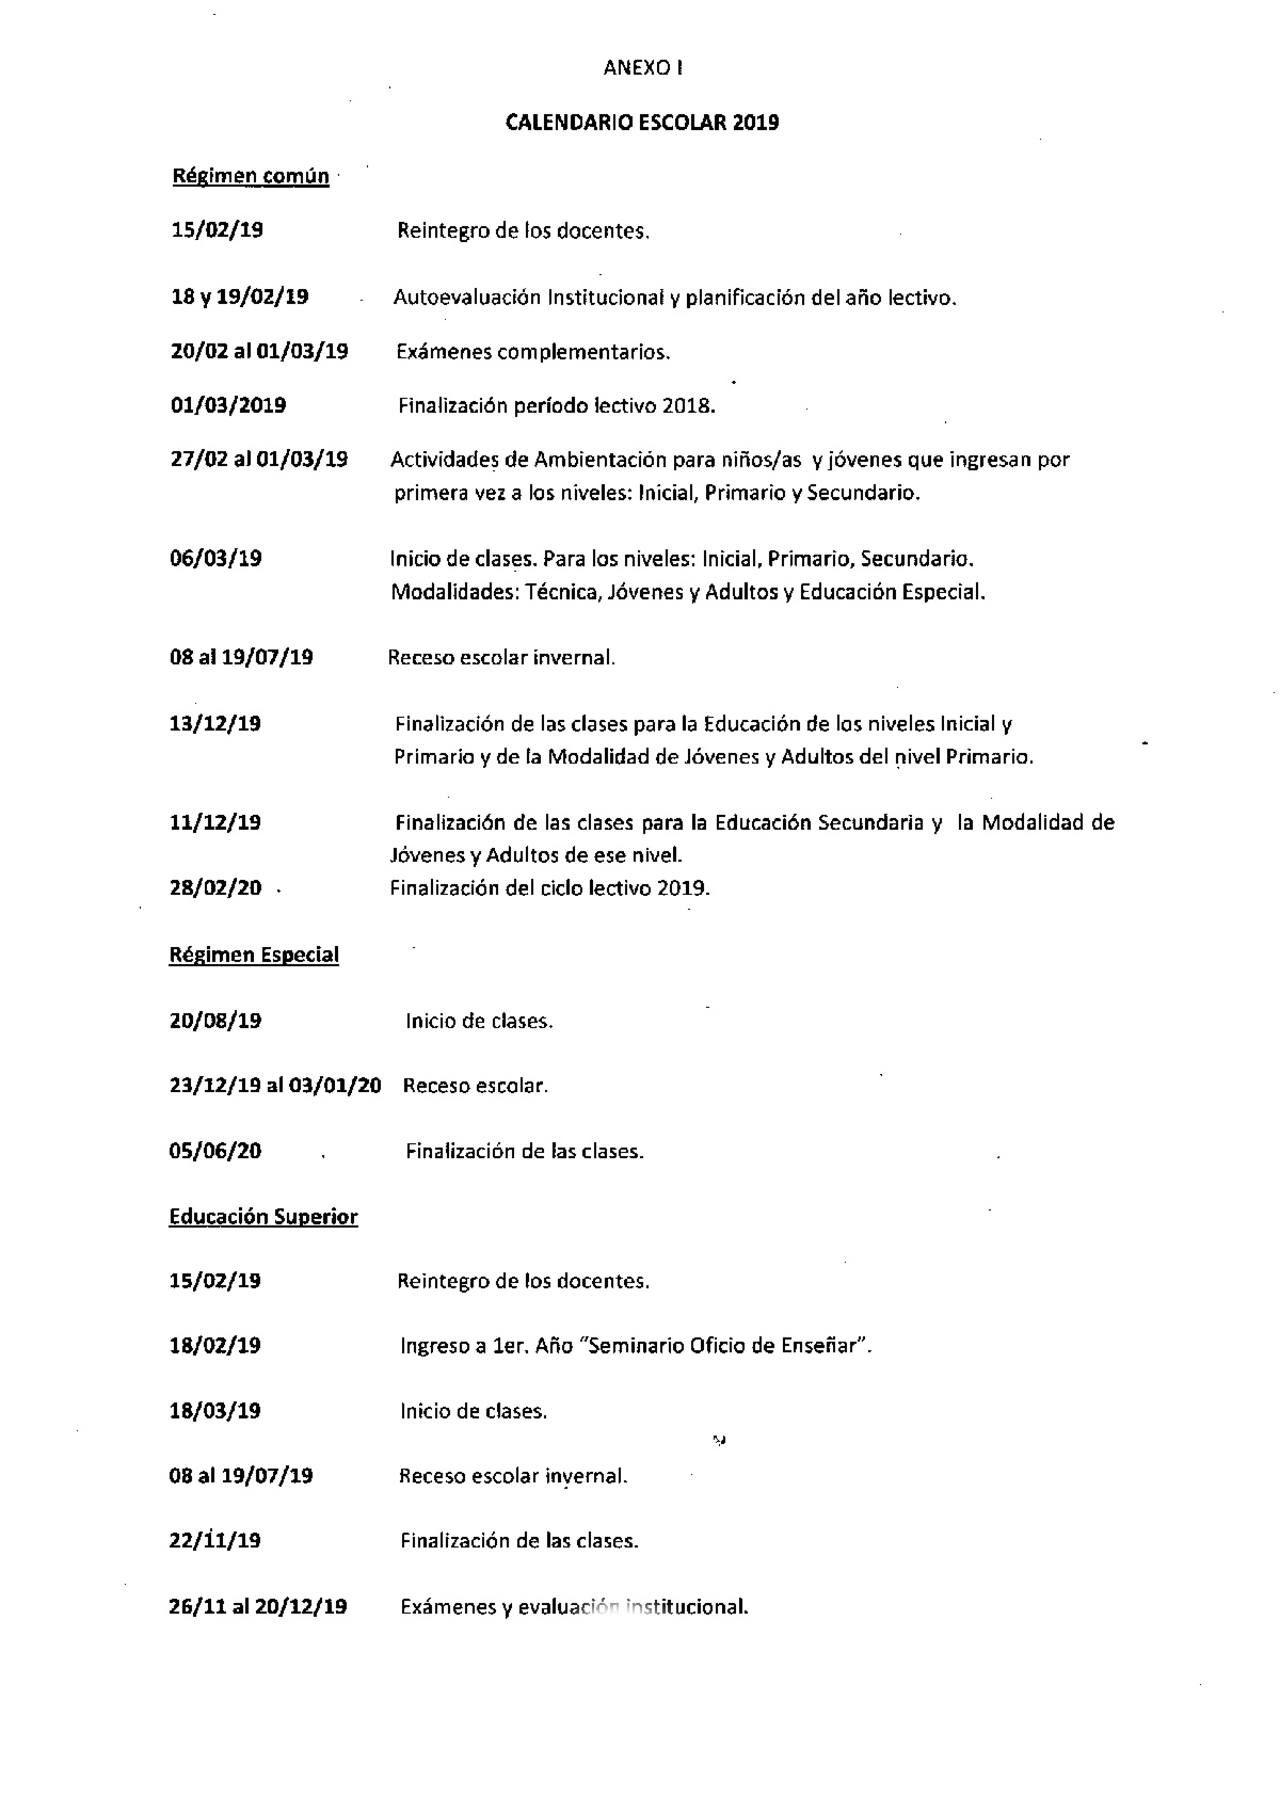 Cómo Será En Córdoba El Calendario Escolar 2019 Educación Cadena 3 Calendario Escolar Autoevaluacion Calendario